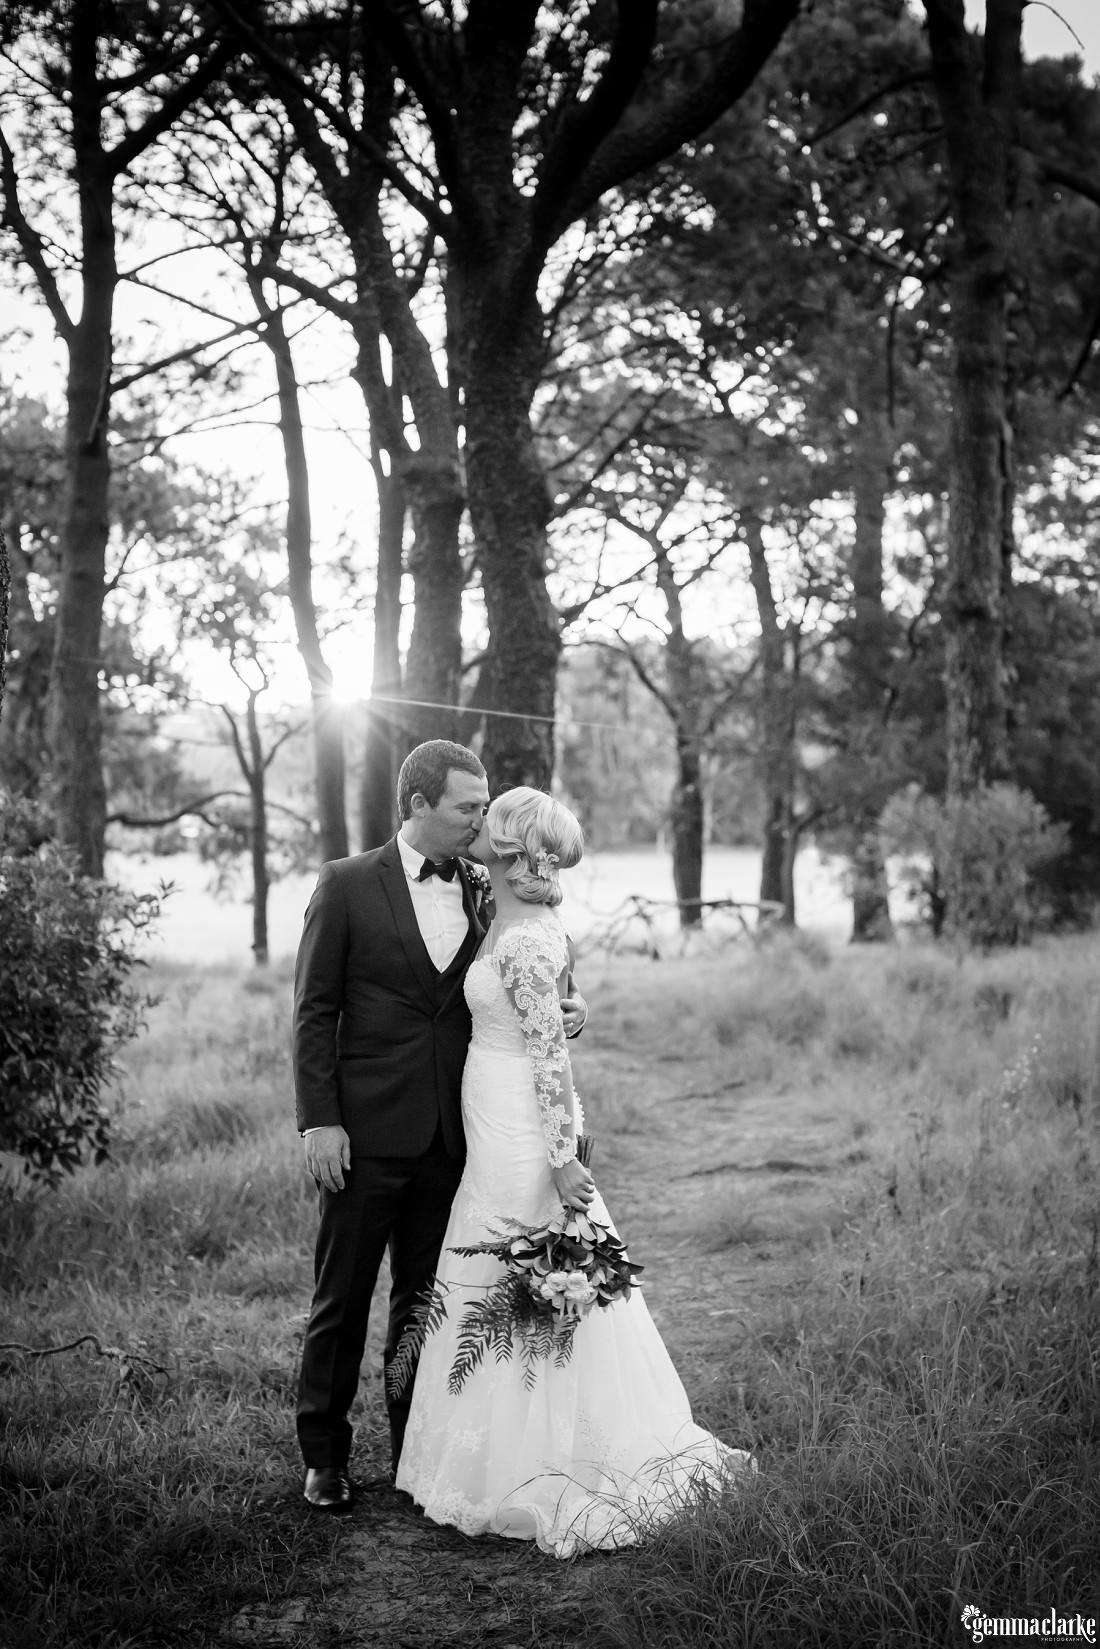 A bride and groom kiss as the setting sun shines through the trees behind them - Centennial Park Wedding